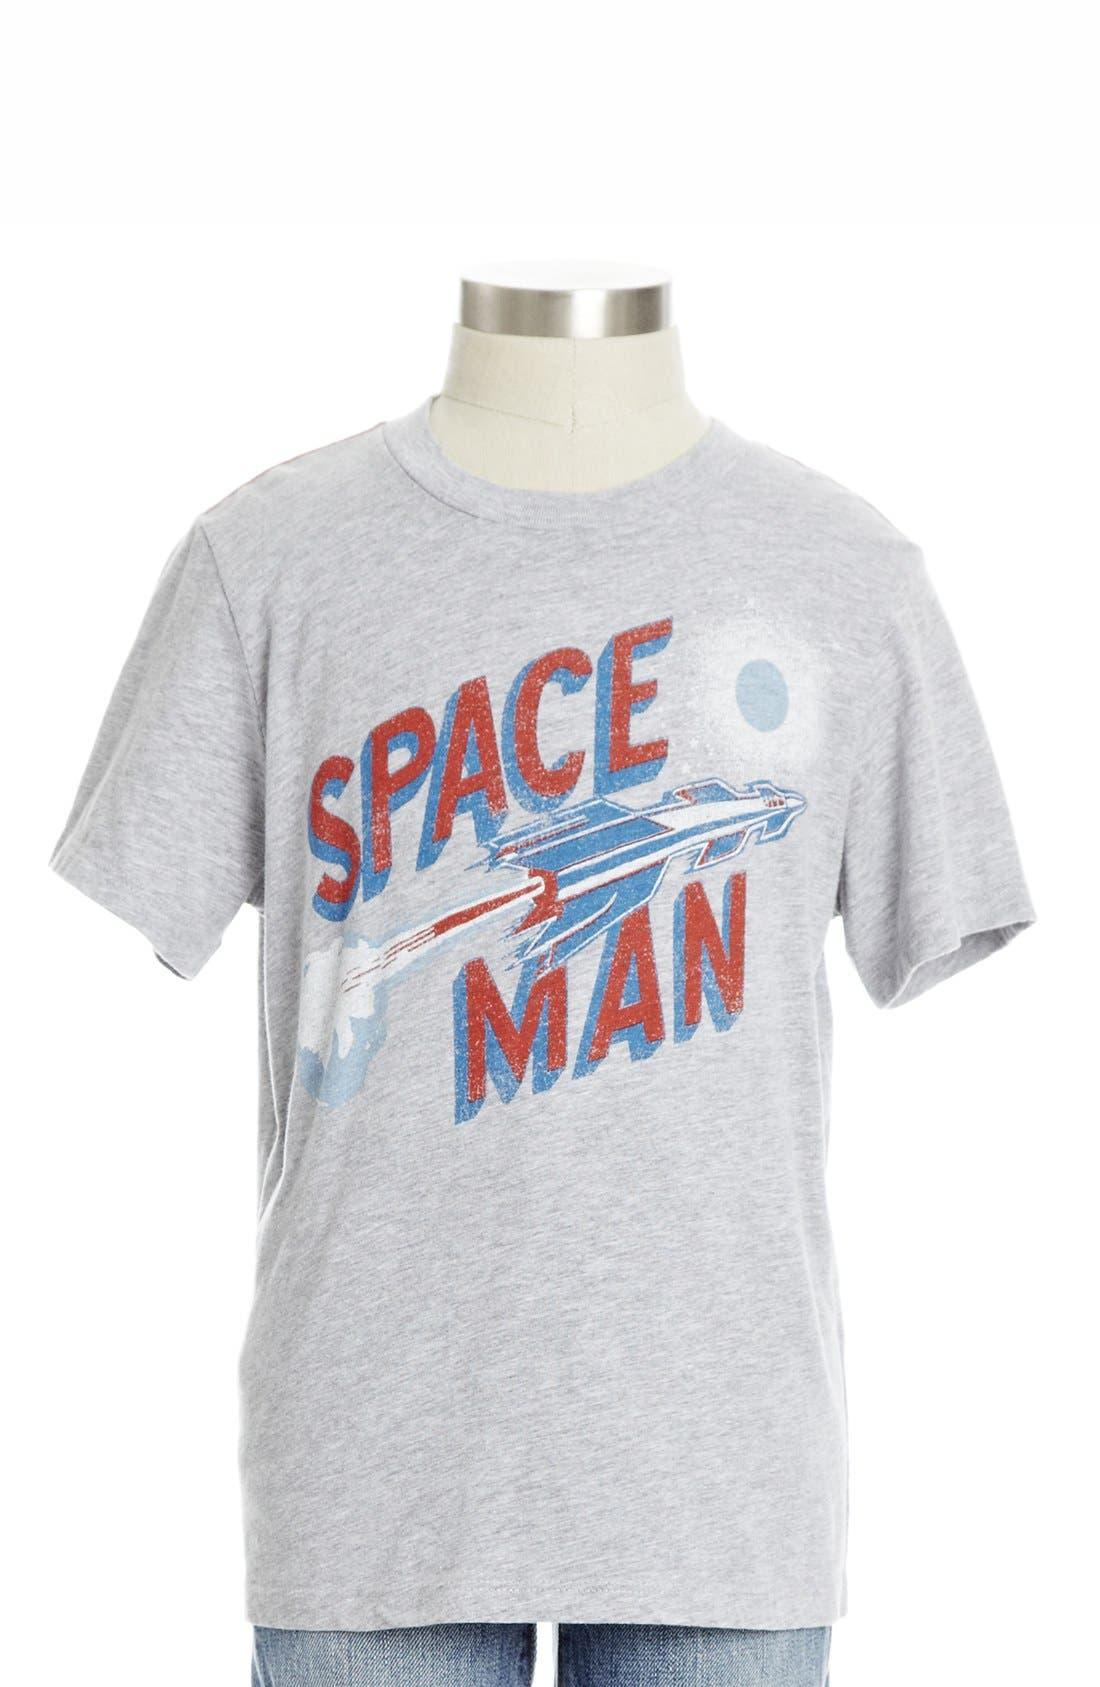 Alternate Image 1 Selected - Peek 'Space Man' Crewneck T-Shirt (Toddler Boys, Little Boys & Big Boys)